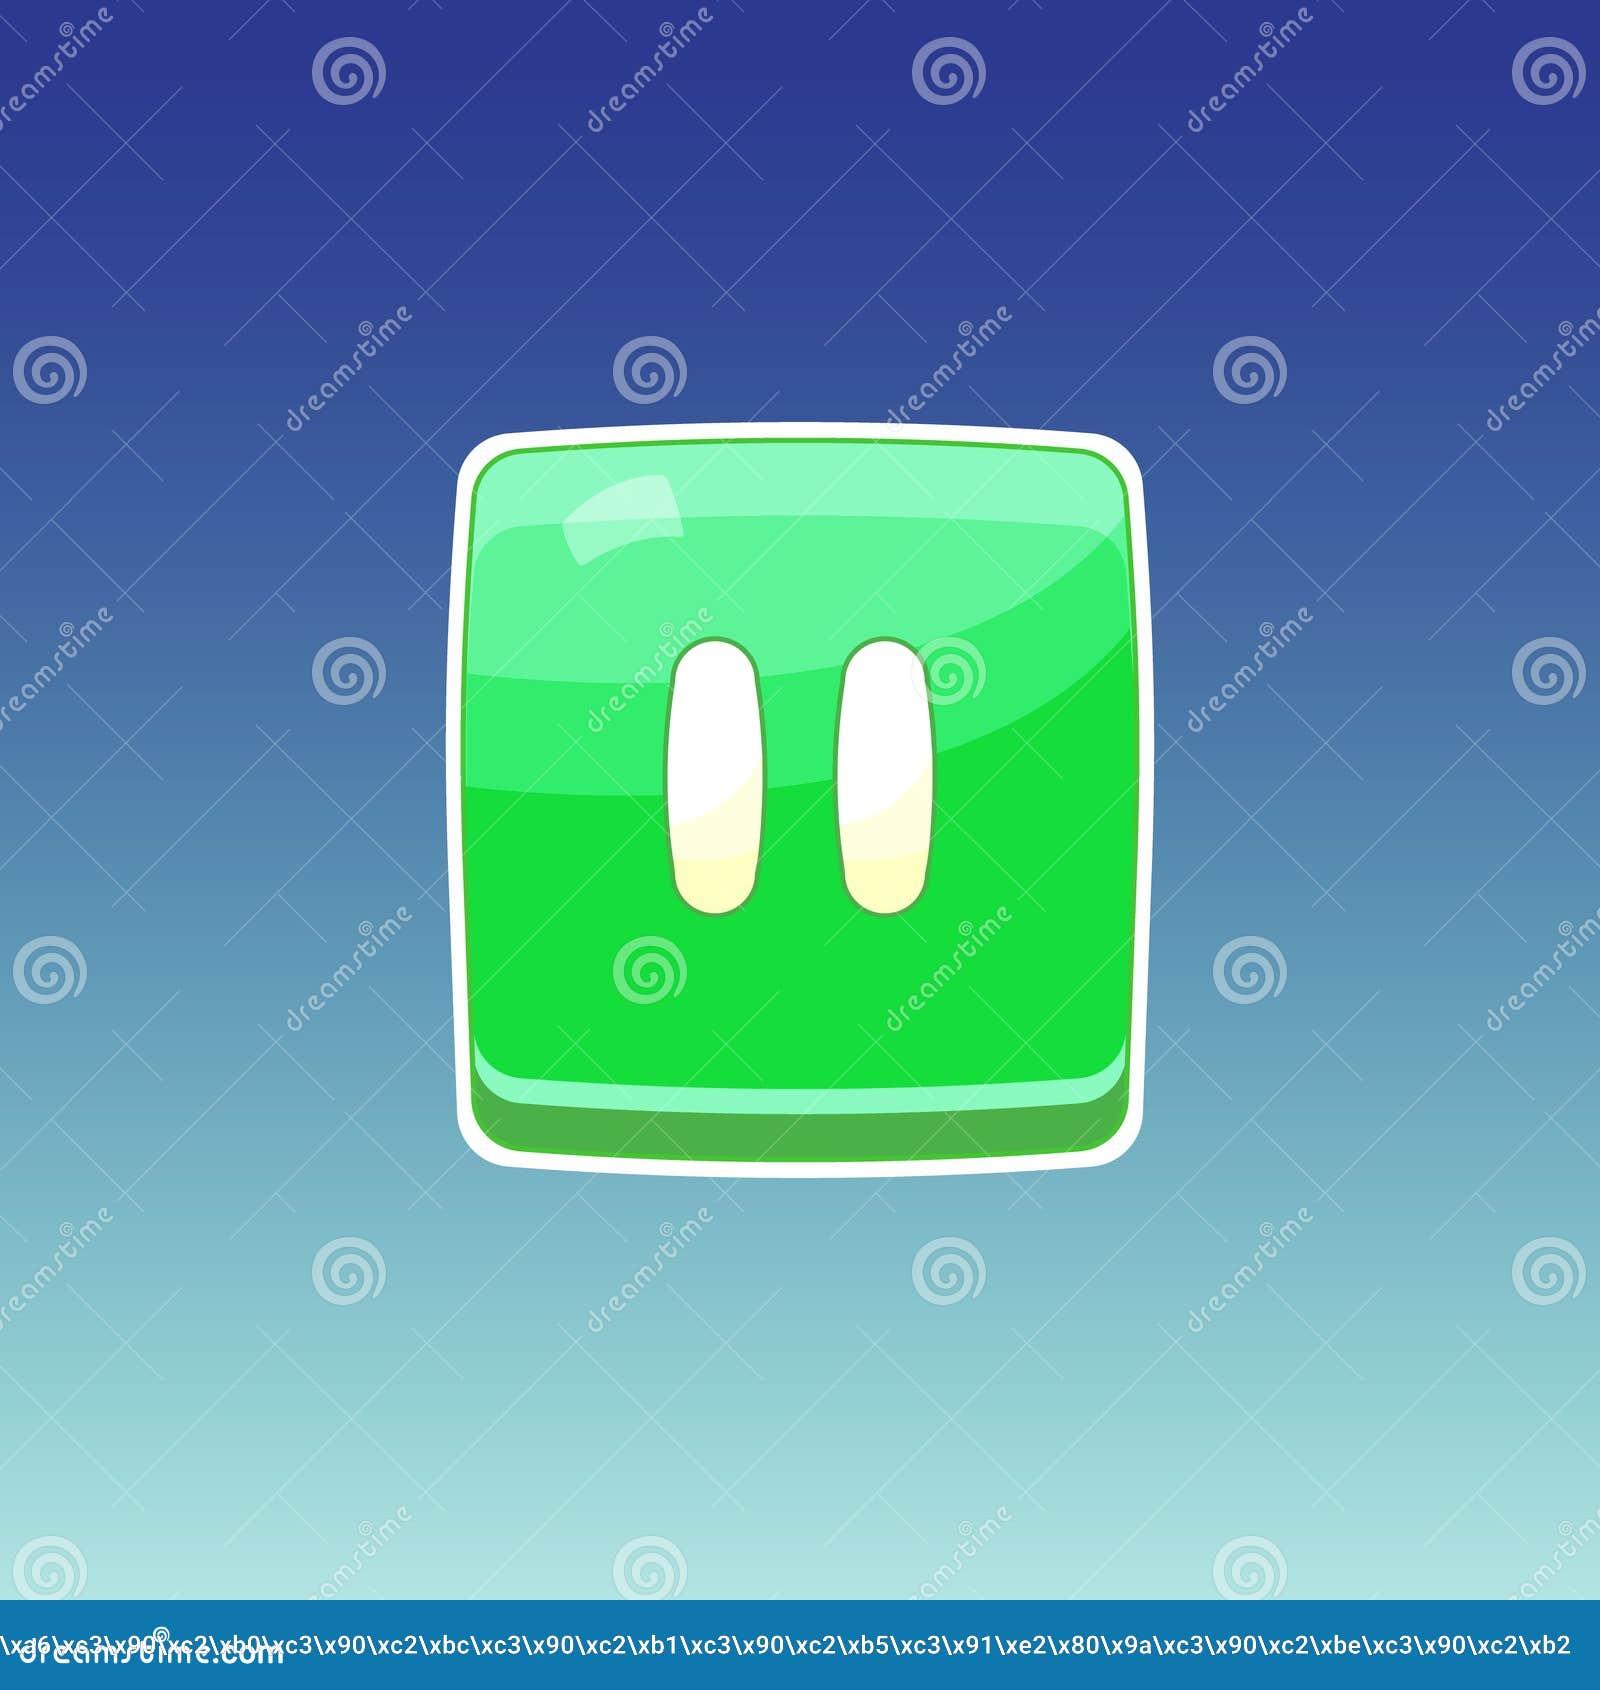 Grüner Knopf des Spiels